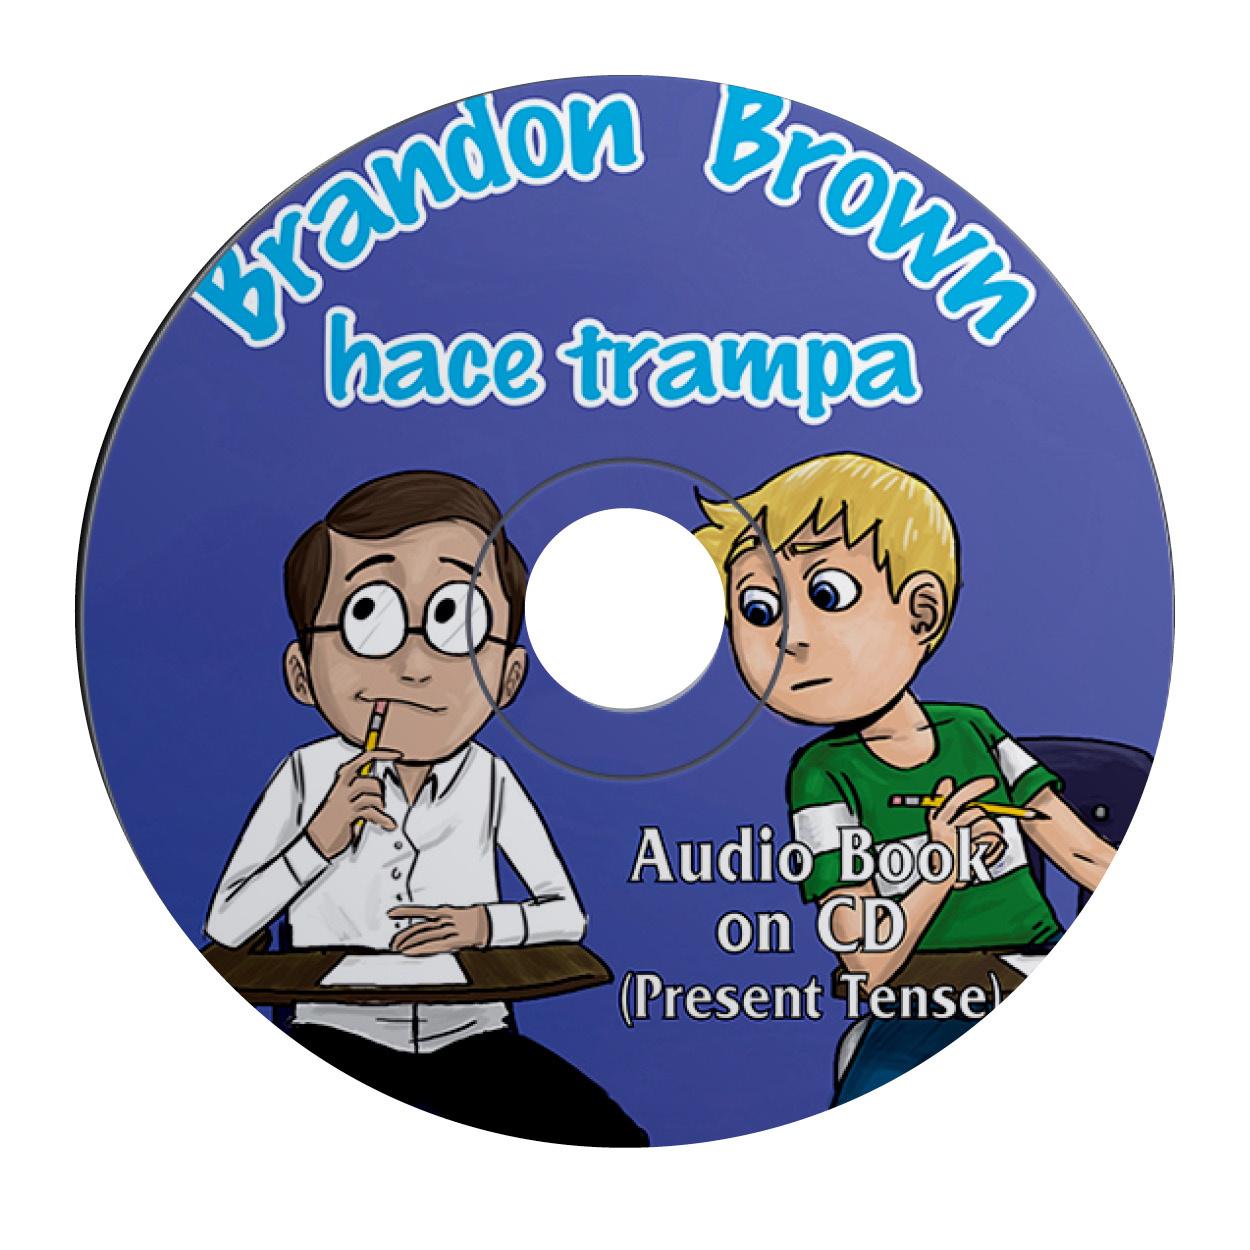 Brandon Brown hace trampa - Audiobook